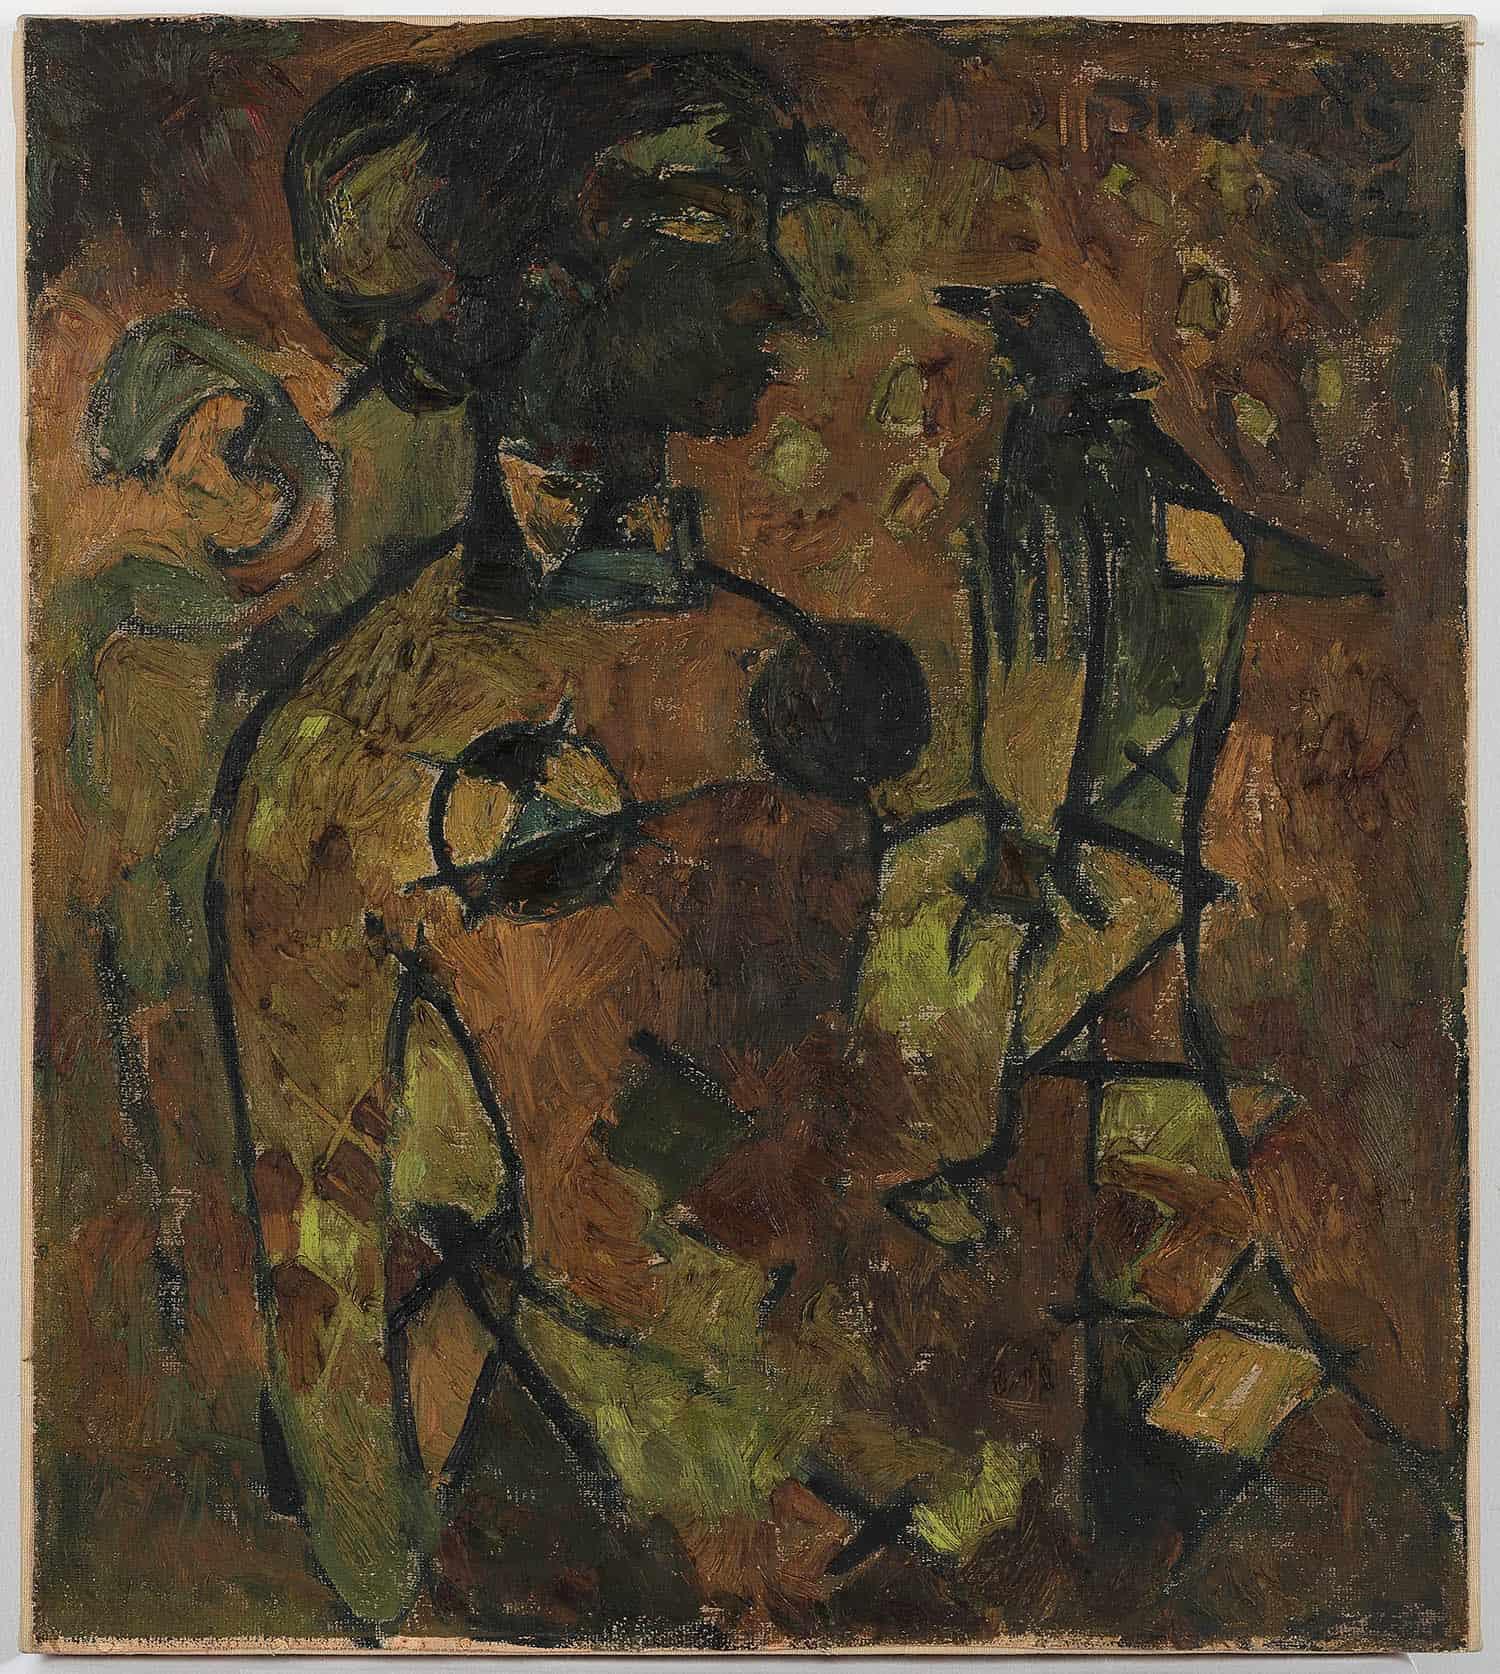 Lot 14 -V S GaitondeGÇÖs rare figurative painting of Oscar winner Bhanu Athaiya, painted in 1952, sold at INR 3 crores (USD 454,545)